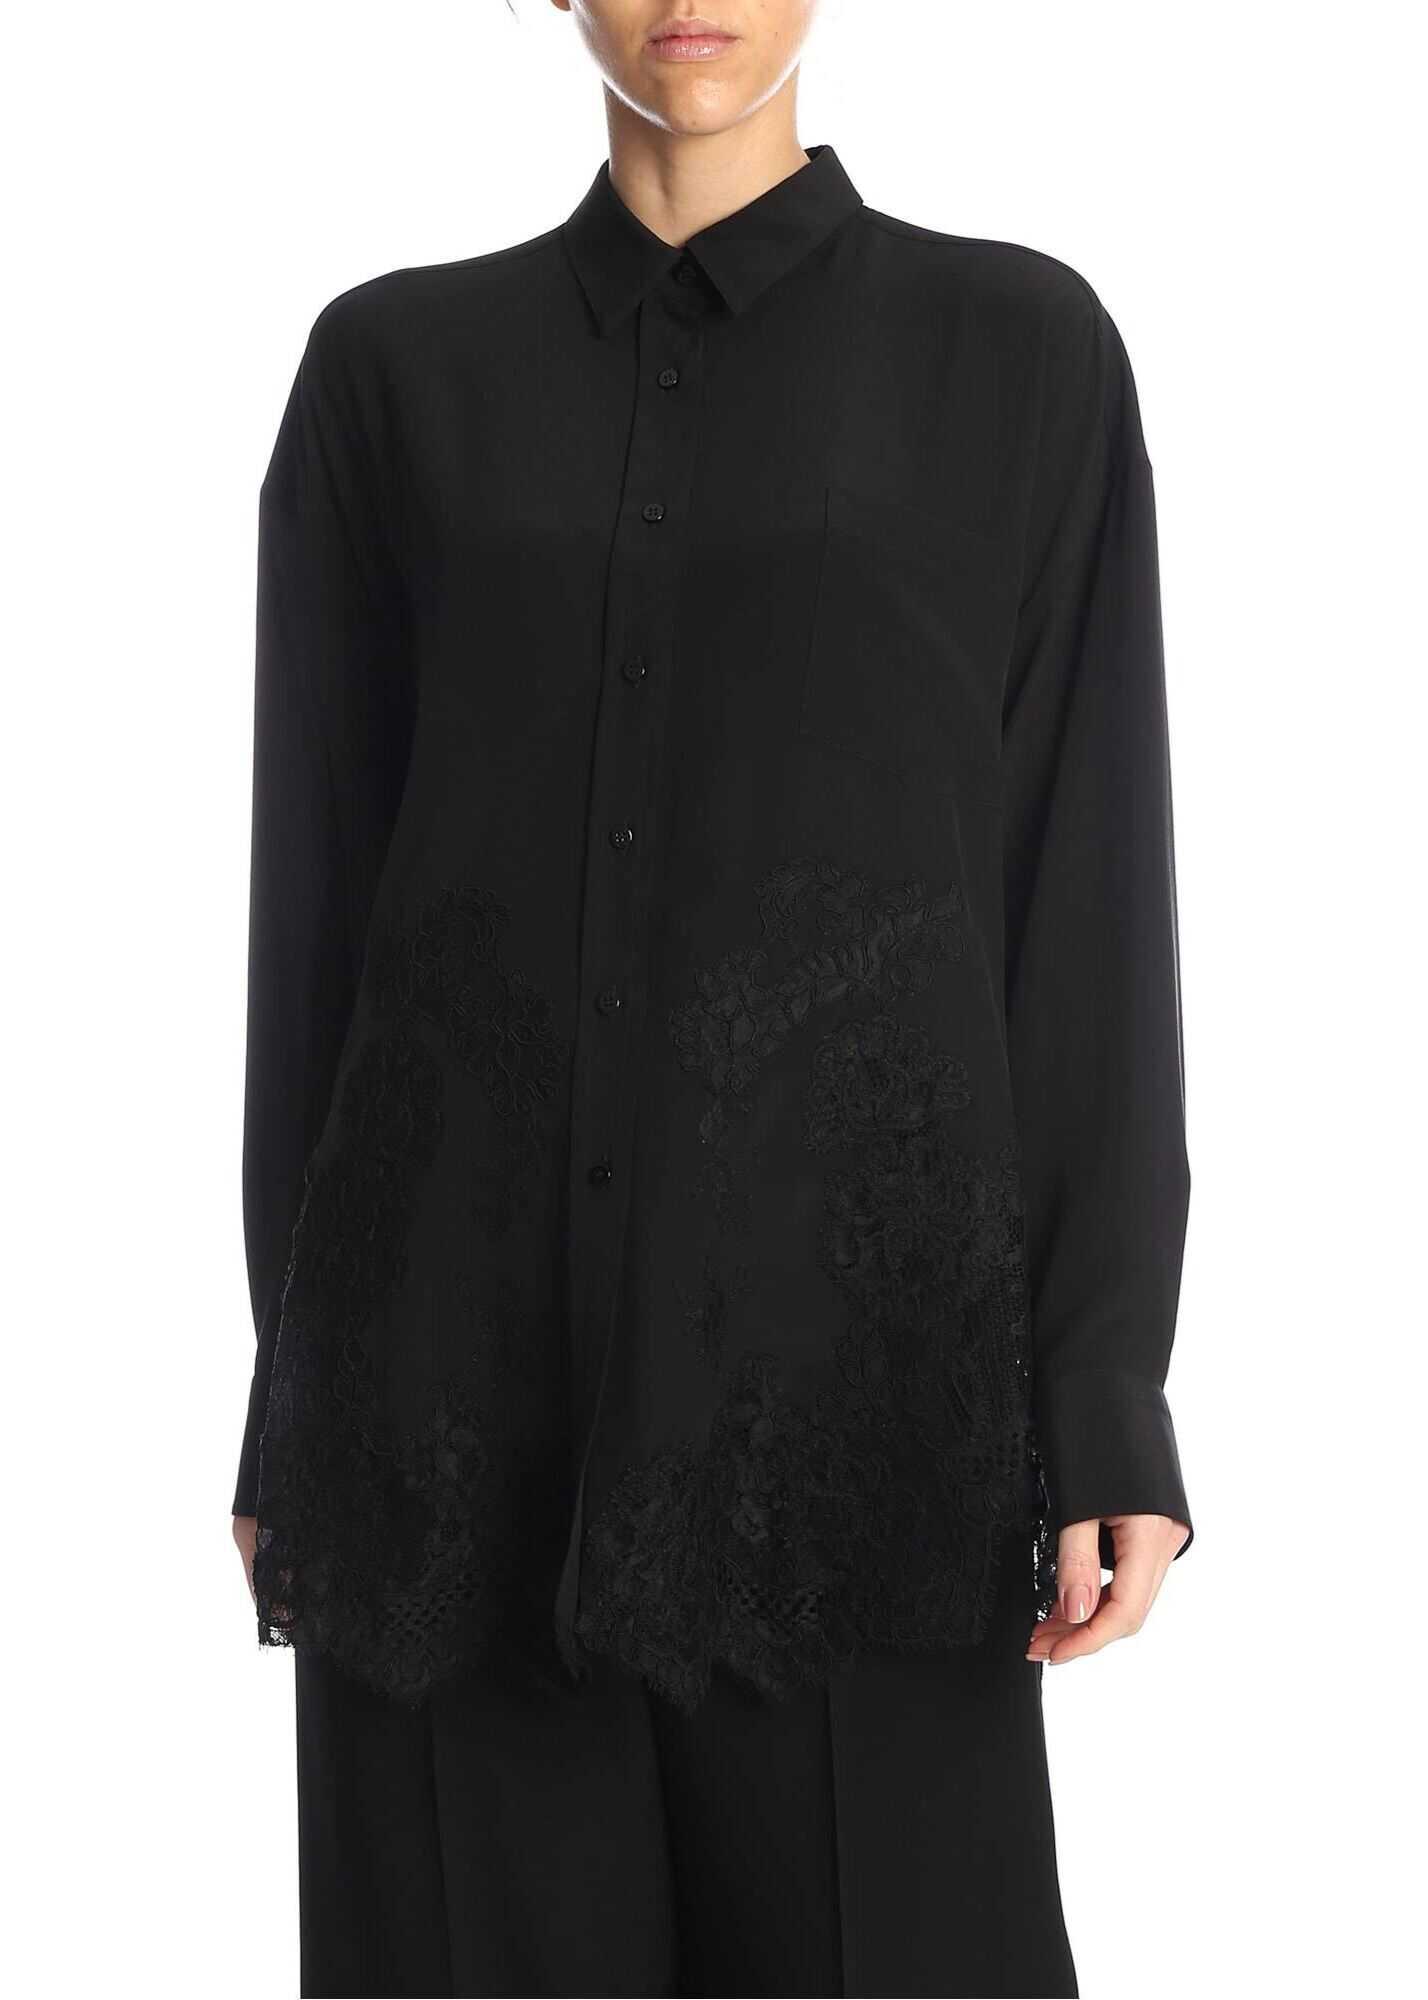 Ermanno Scervino Lace Inserts Shirt In Black Black